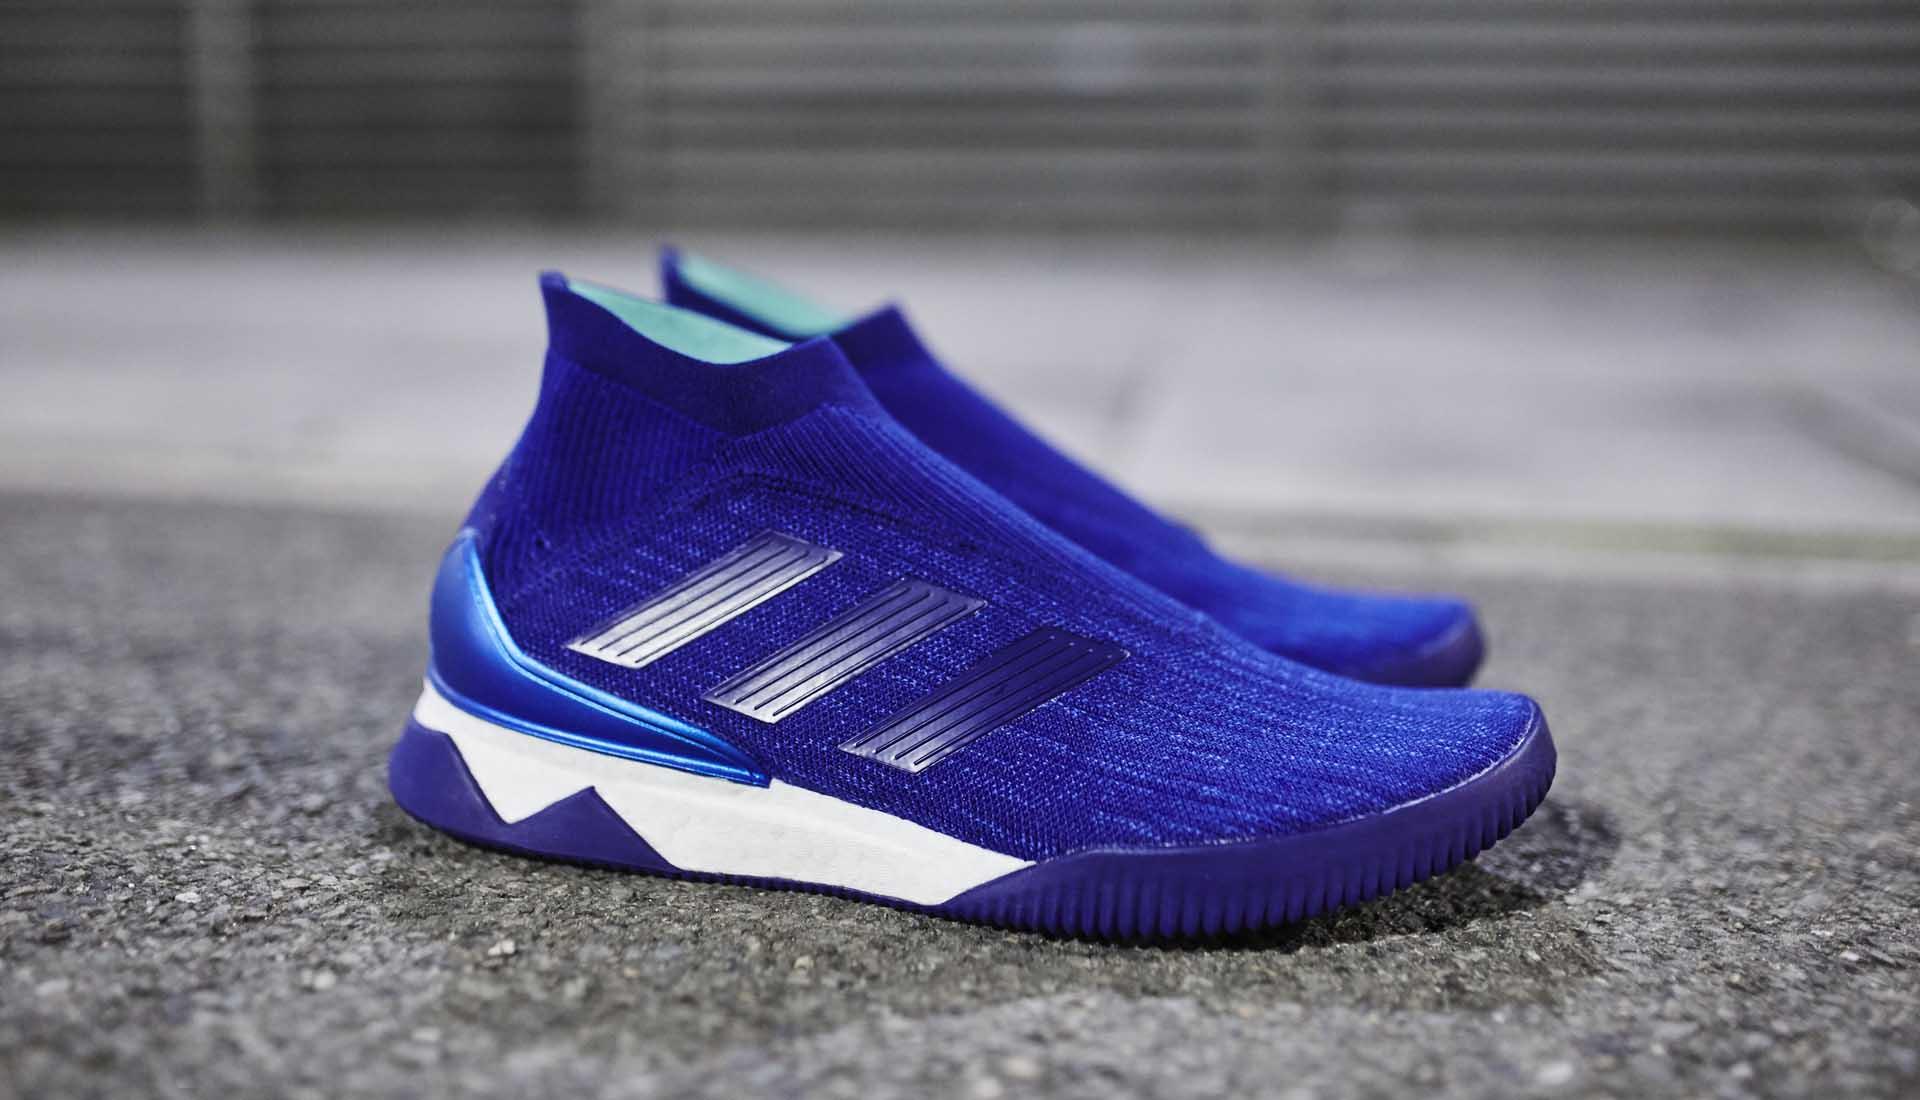 sneakers-adidas-Predator-Tango-18-UltraBoost-Deadly-Strike-img5